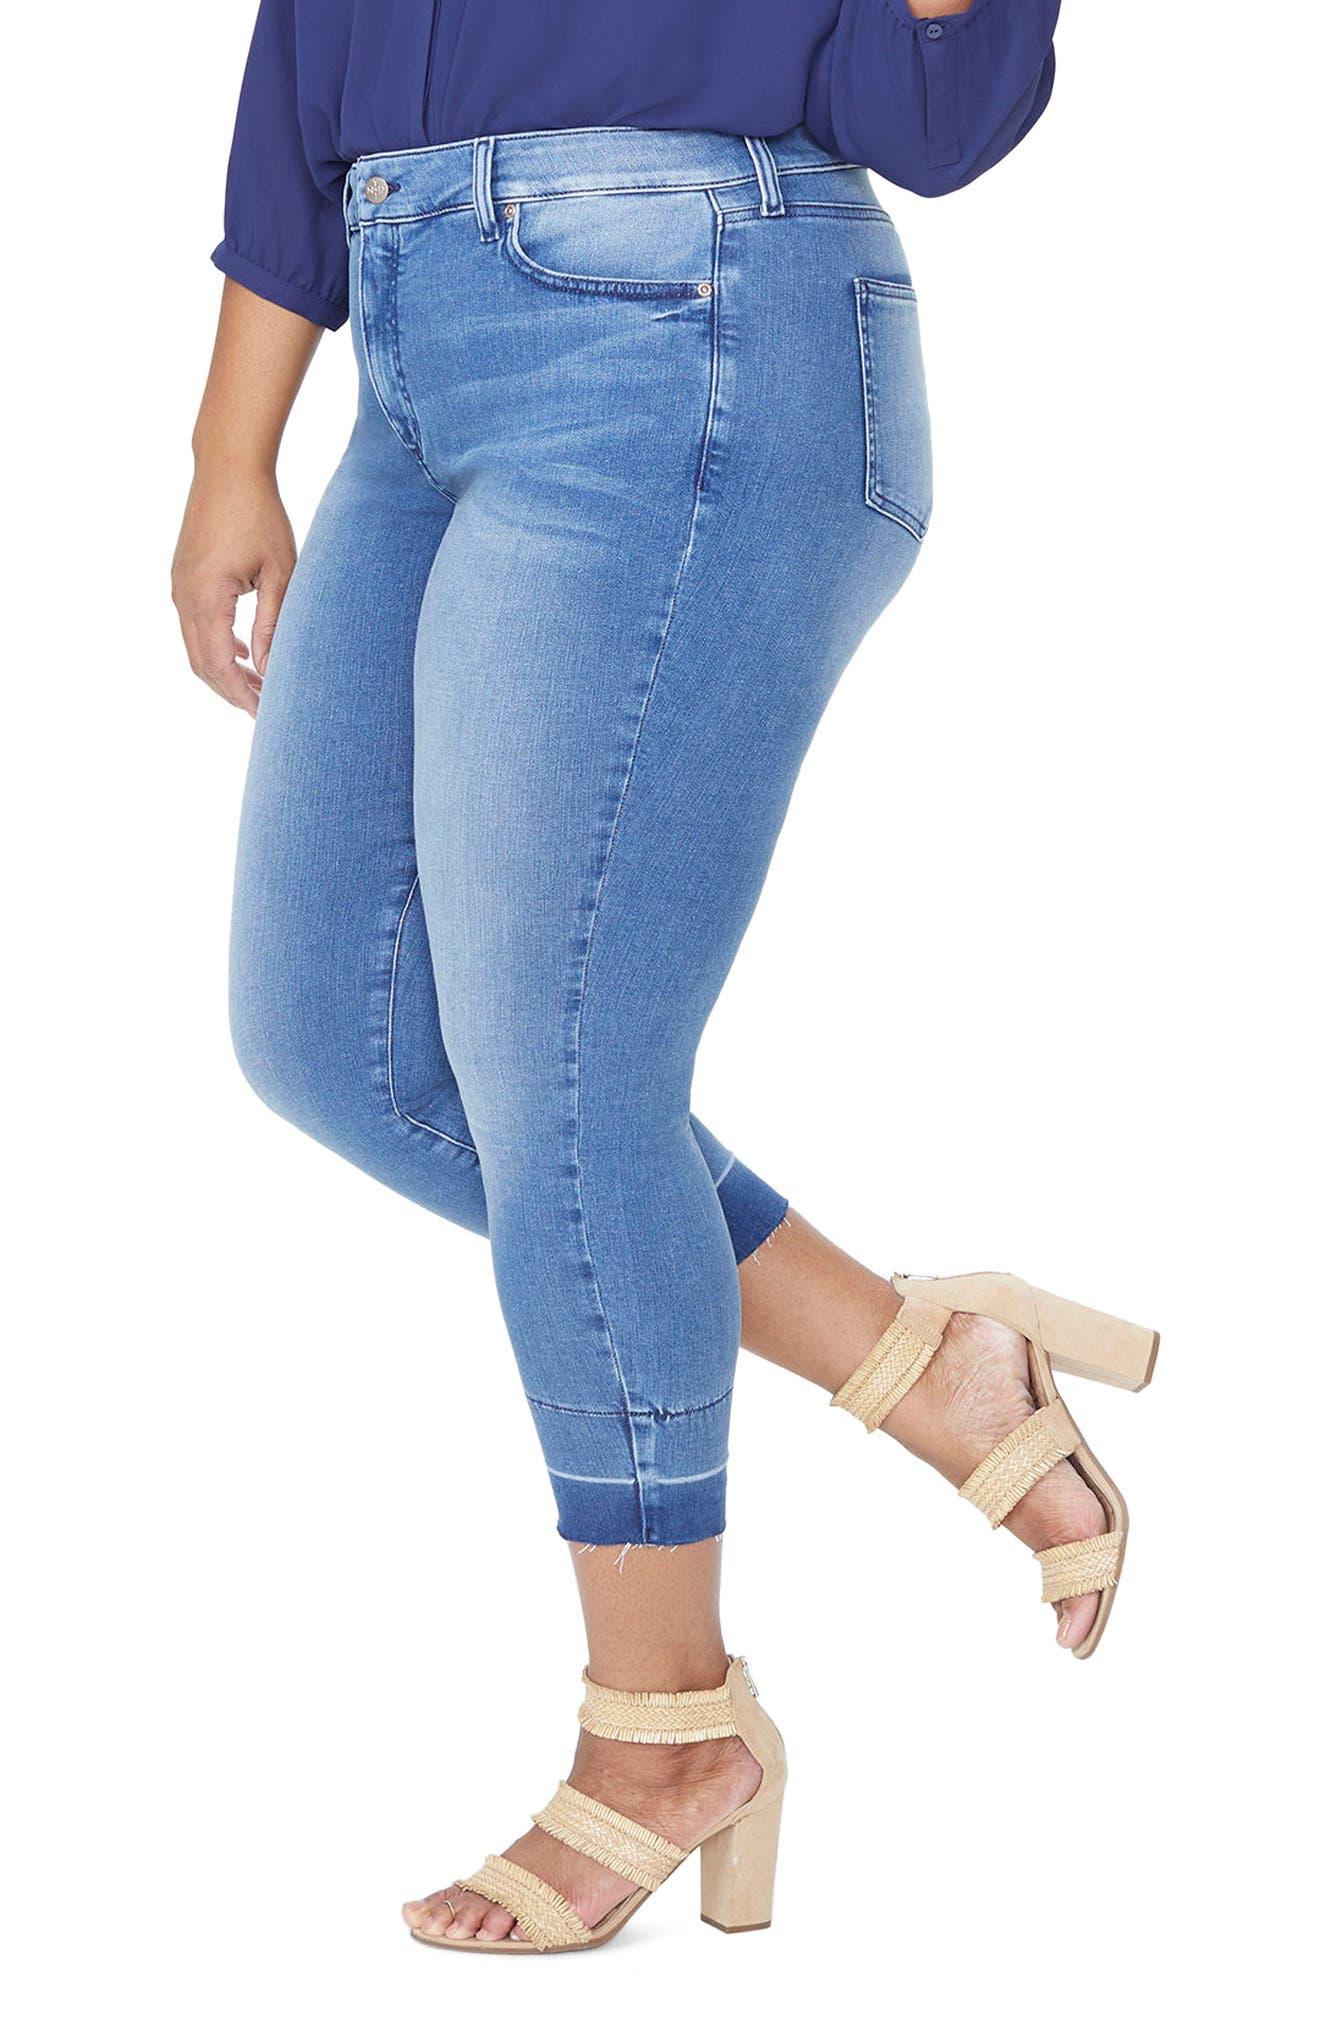 Alina Release Hem Ankle Skinny Jeans,                             Alternate thumbnail 3, color,                             410